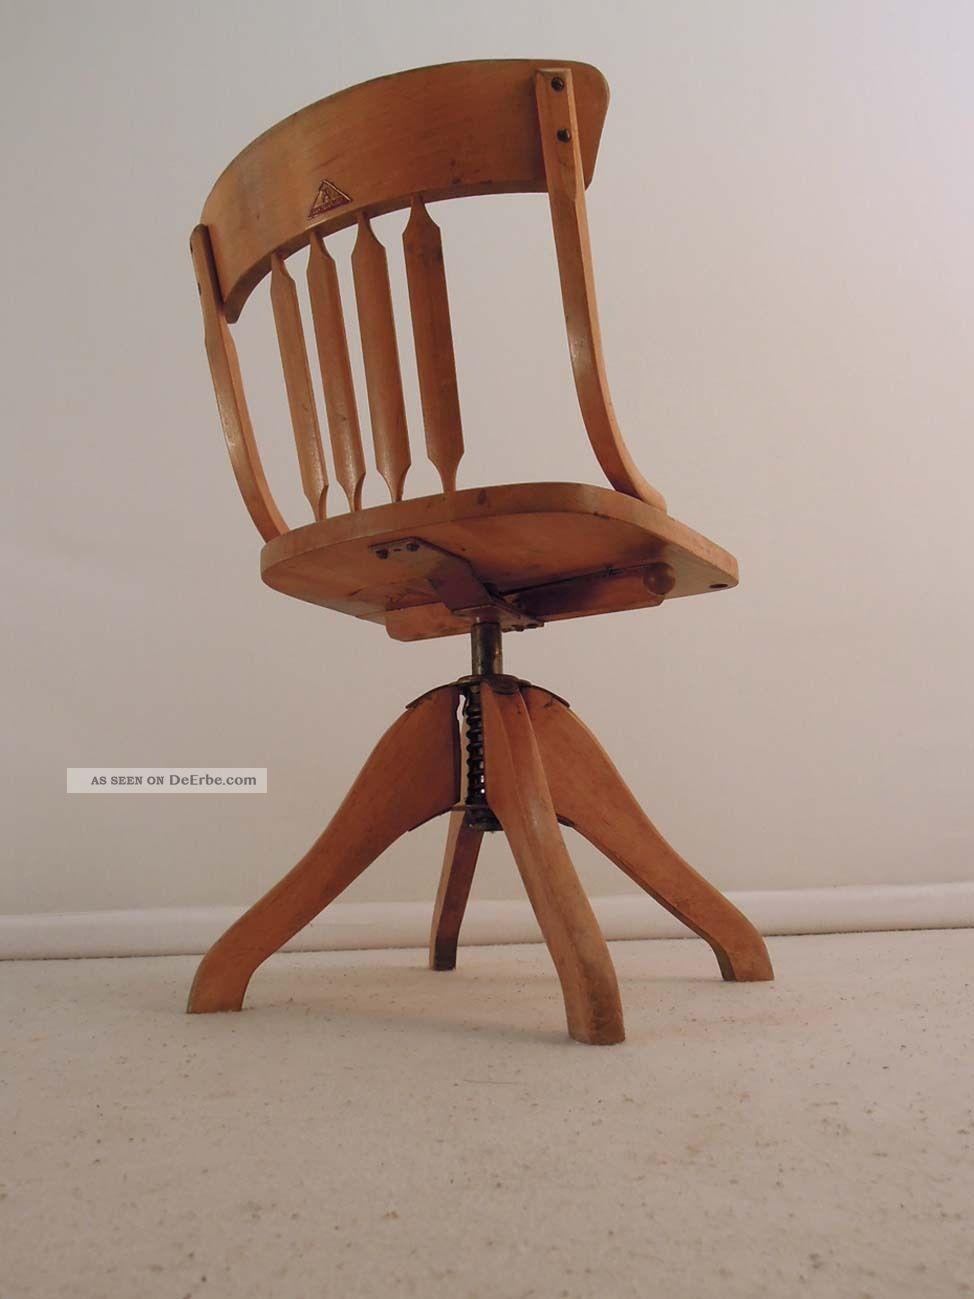 brostuhl jacobsen best cheap ideaa brostuhl kinder kind fr brostuhl fr kinder with brostuhl fr. Black Bedroom Furniture Sets. Home Design Ideas